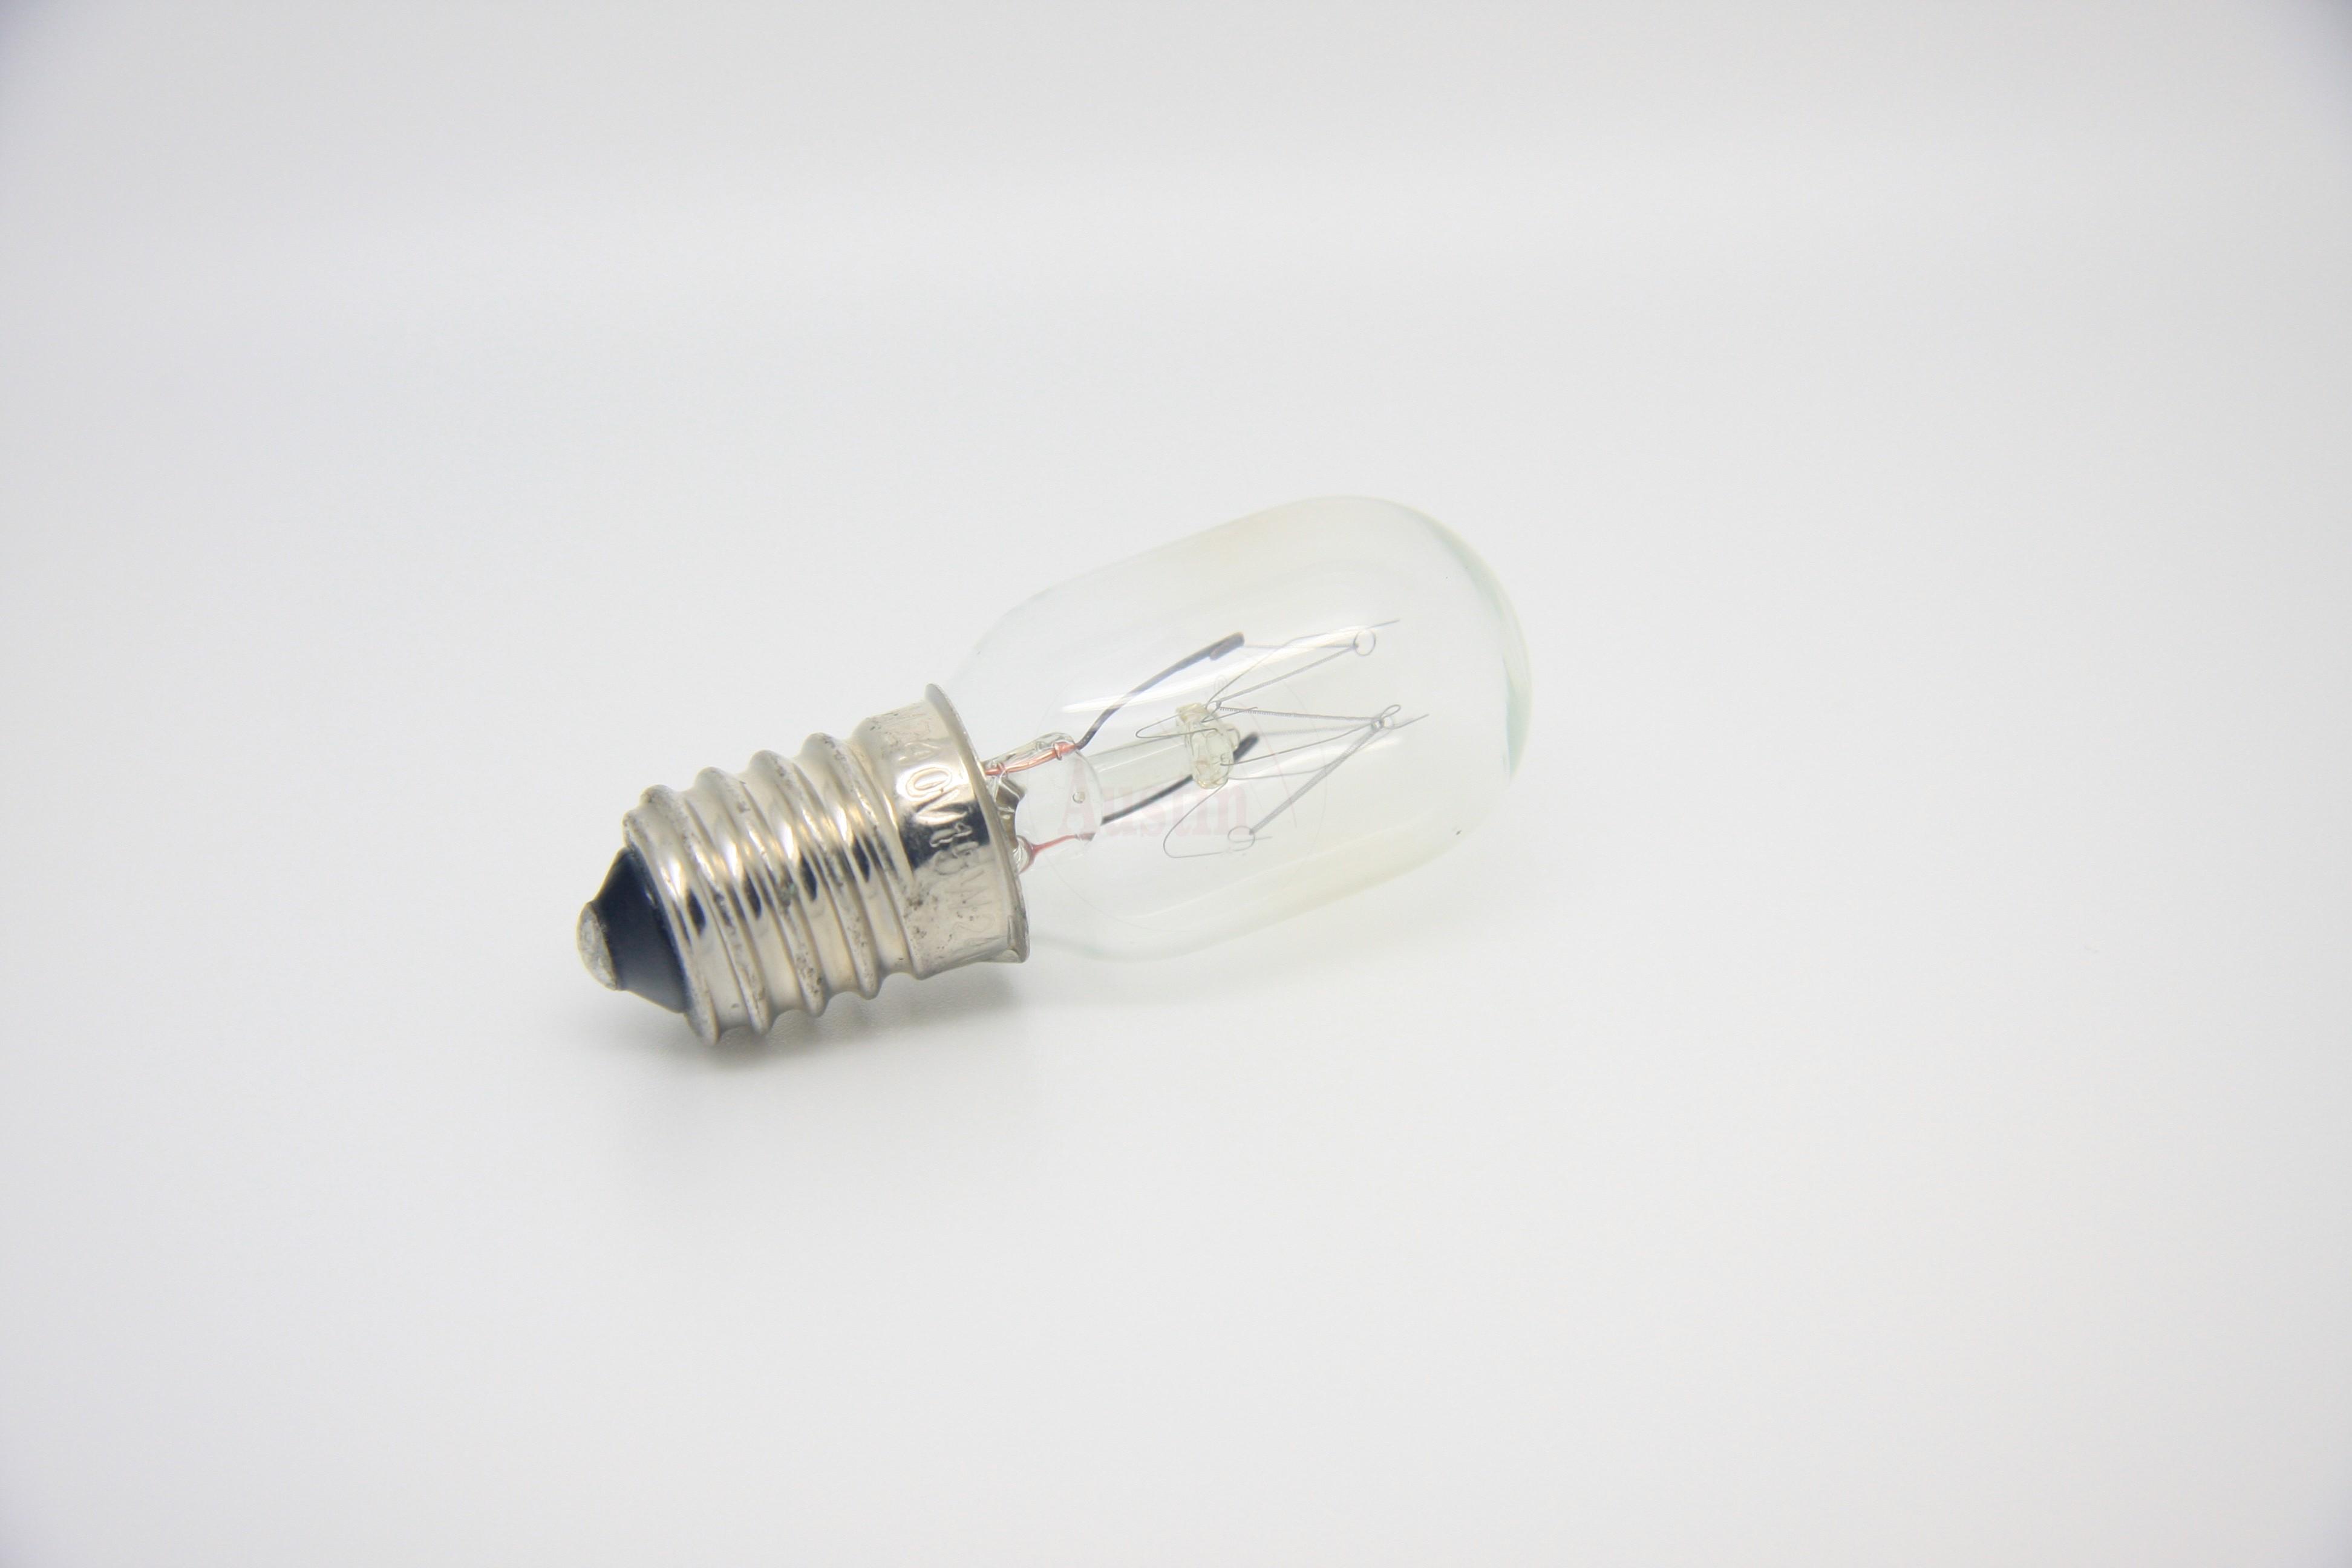 Sewing Machine Light Bulb Screw In 15 Watt SES/E14